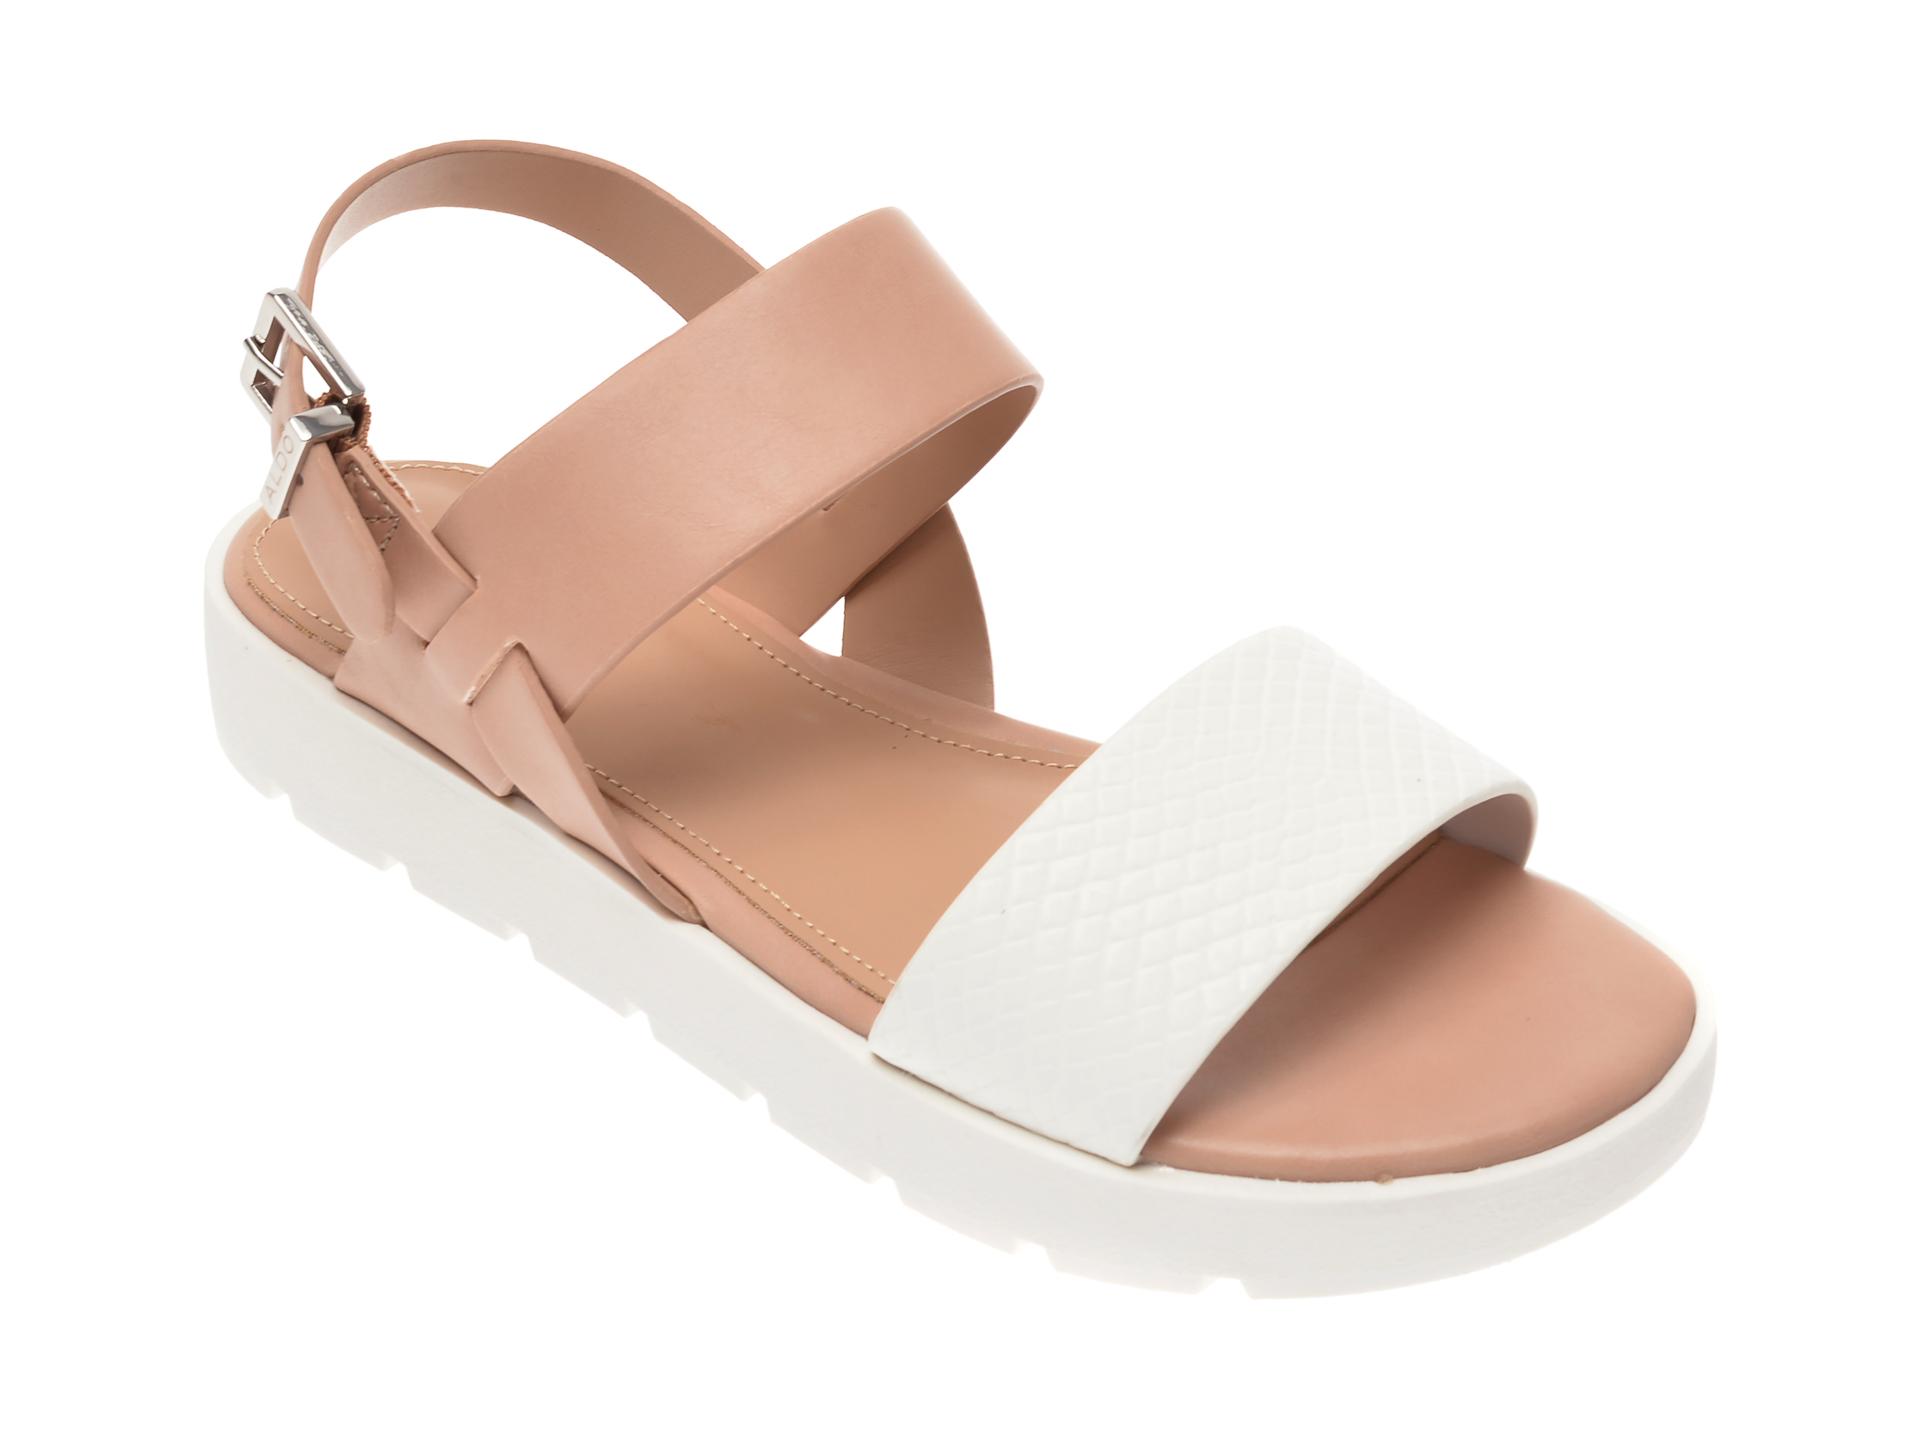 Sandale ALDO albe, Dwylia121, din piele ecologica imagine